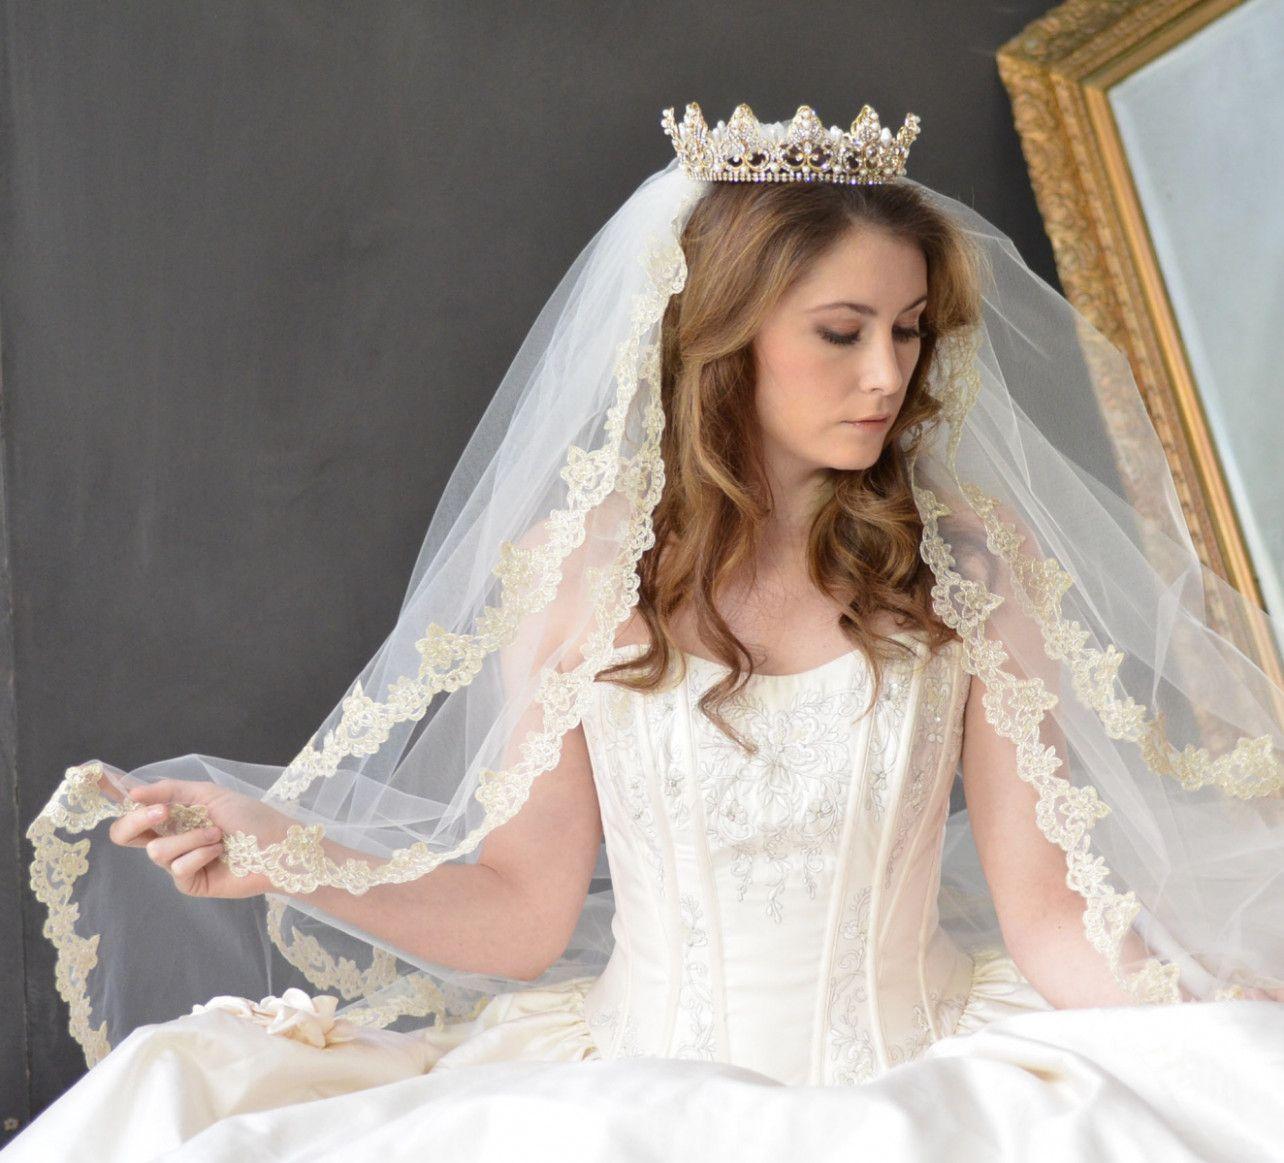 Wedding Veils With Tiara Hair Down Wedding Hairstyles With Veil